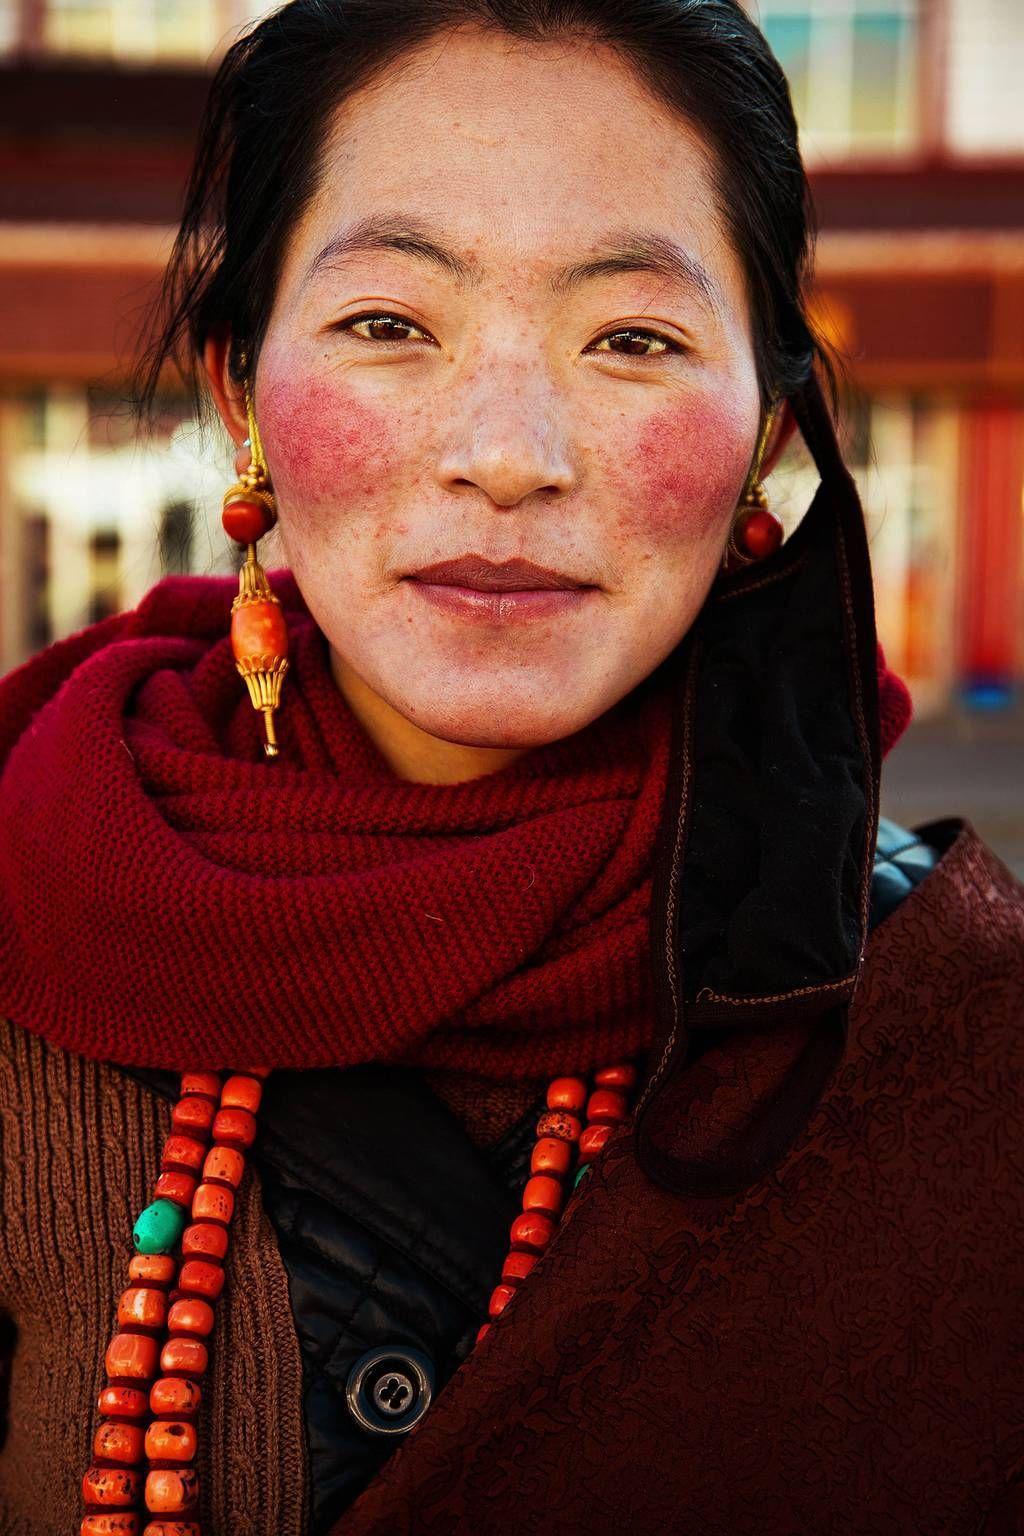 Woman from Platoul Tibetan, China, by Mihaela Noroc   Тибетская женщина, Китай. Фотограф Михаэла Норок